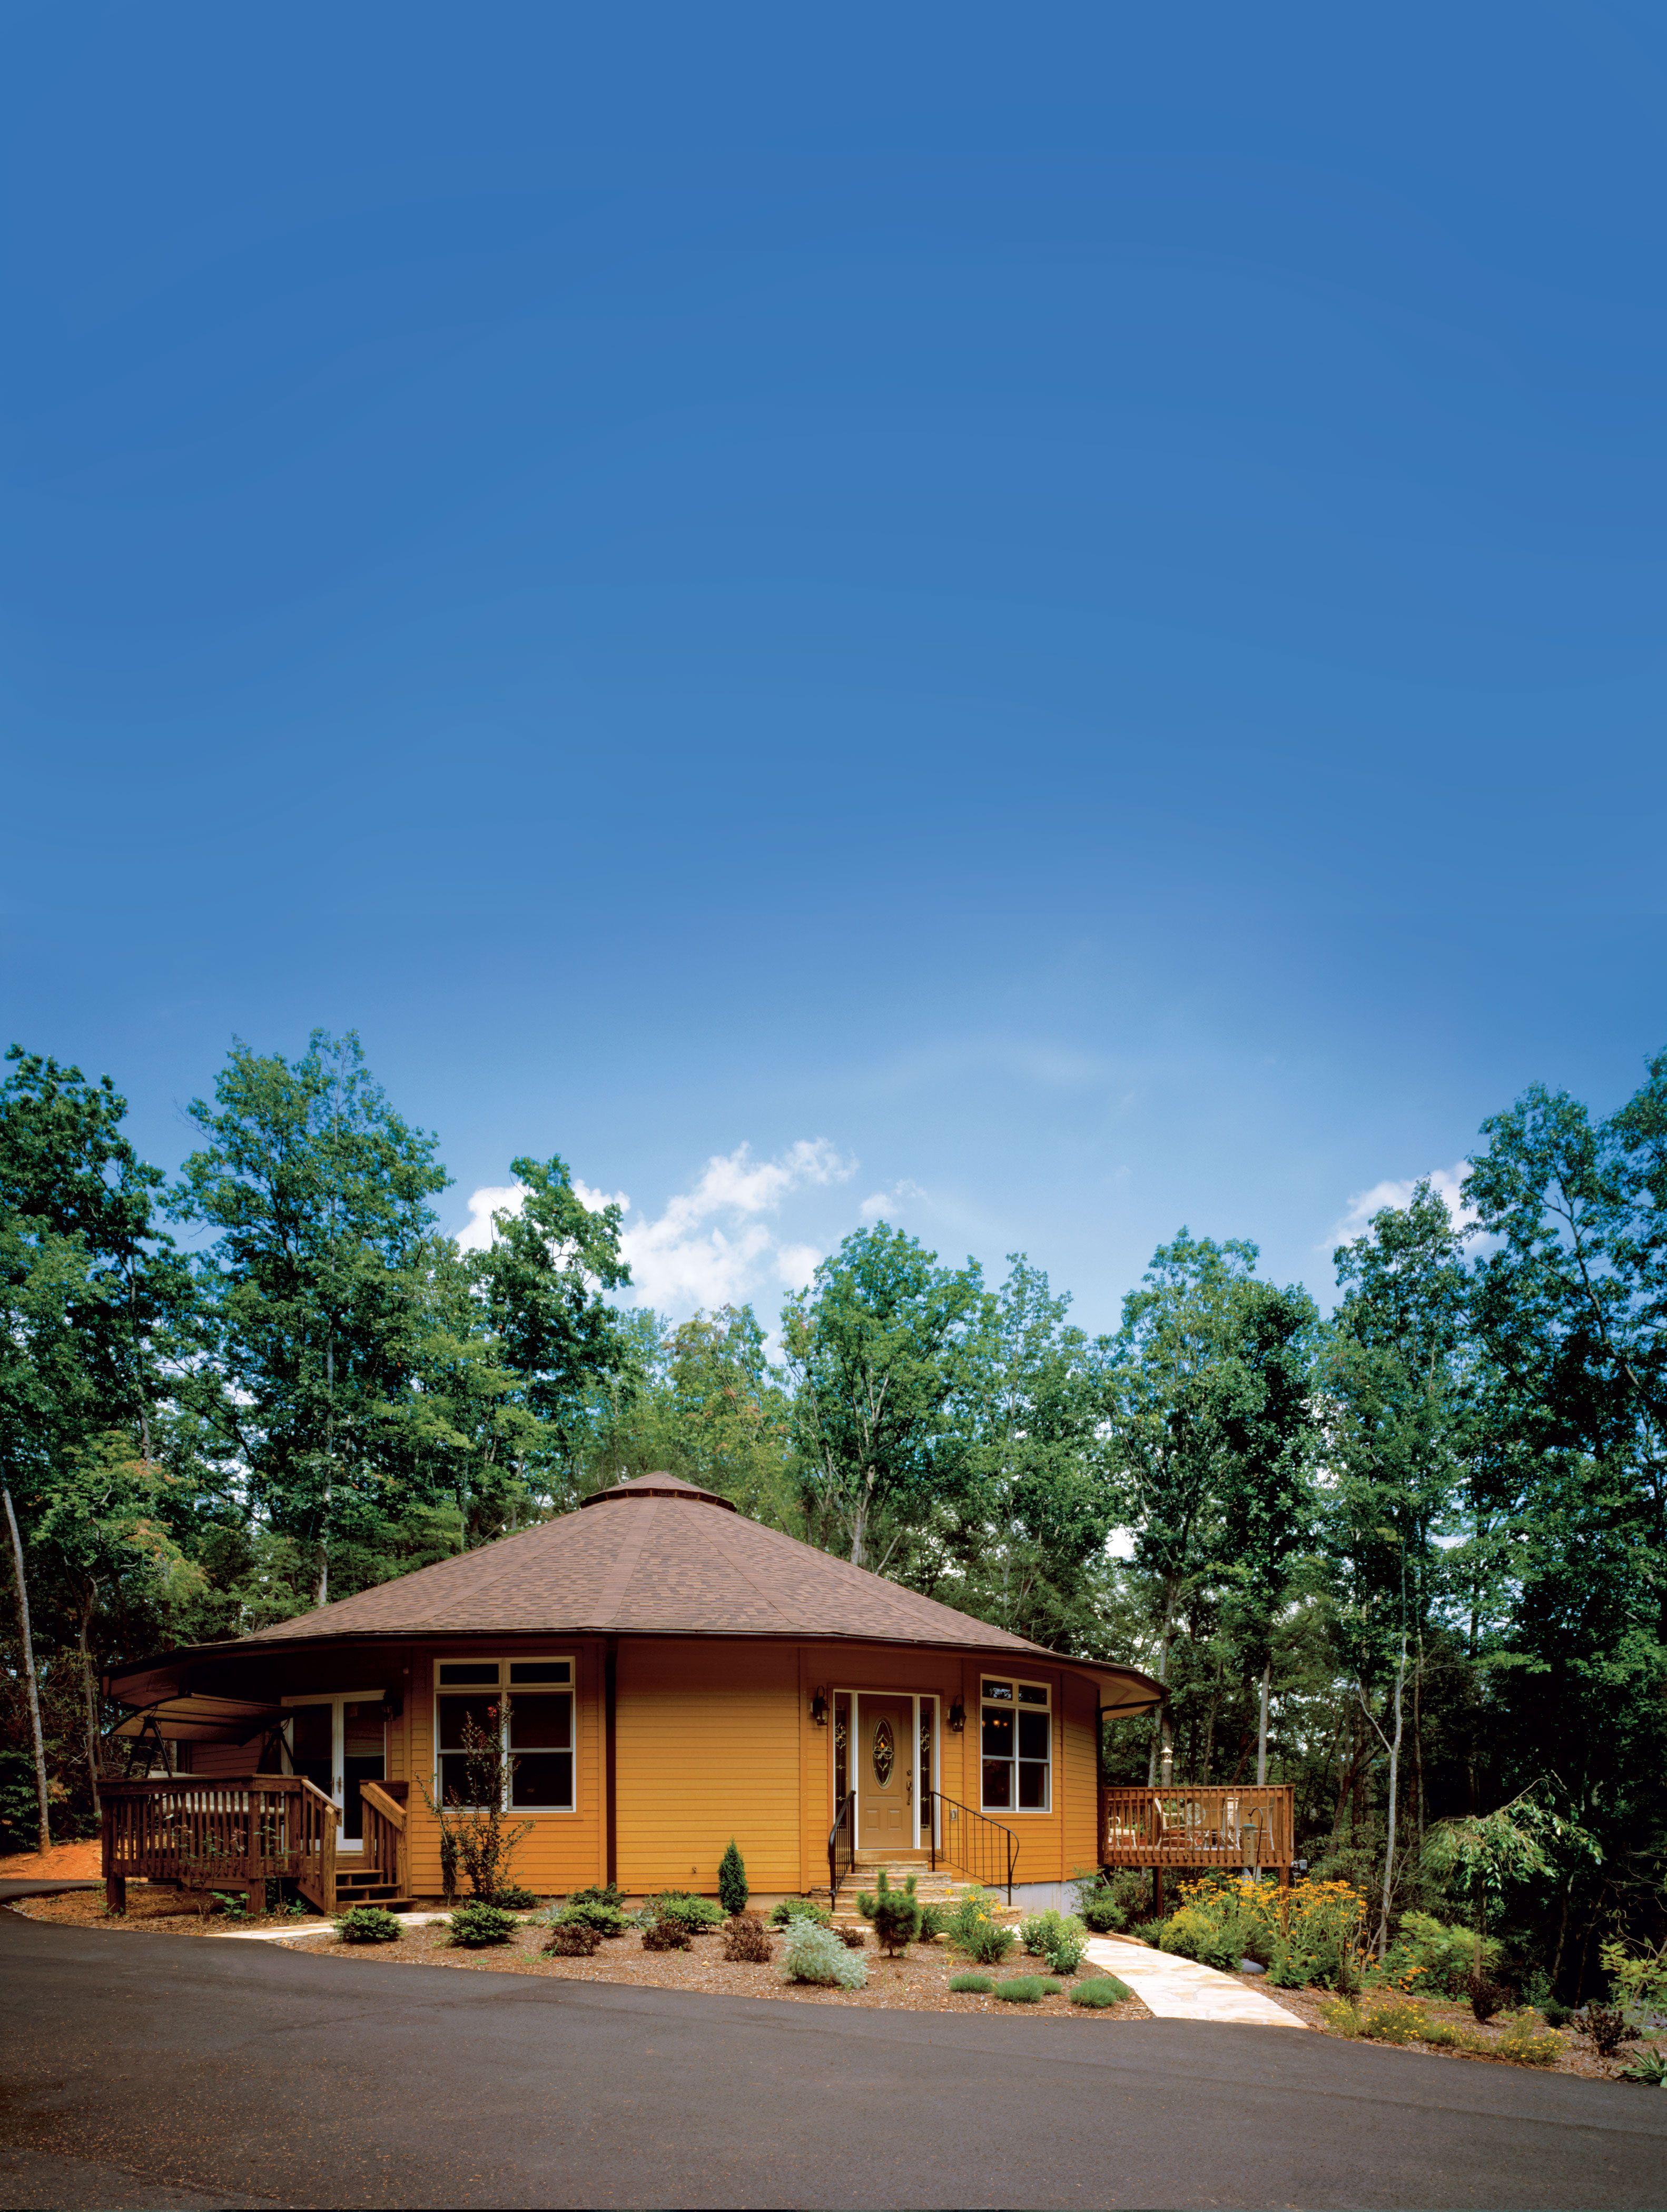 Affordable Green Home - aece1648fee9b83fbfe534ecea15ccb5_Simple Affordable Green Home - aece1648fee9b83fbfe534ecea15ccb5  Image_823115.jpg